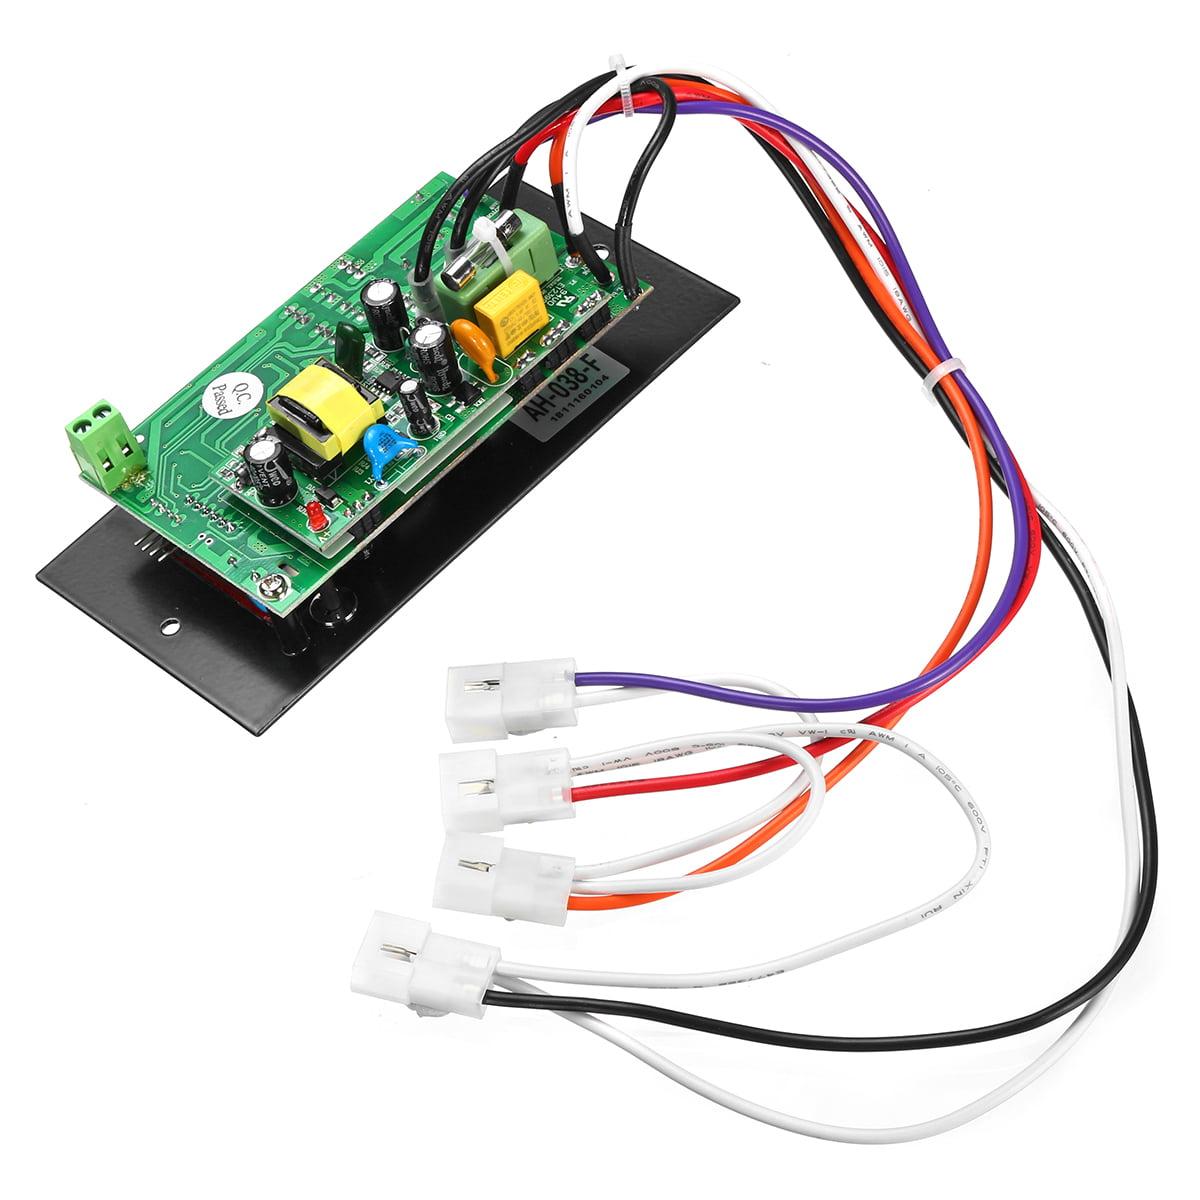 Thermostat Control Board 120V + Probe For Traeger Wood Pellet Grills #BAC236